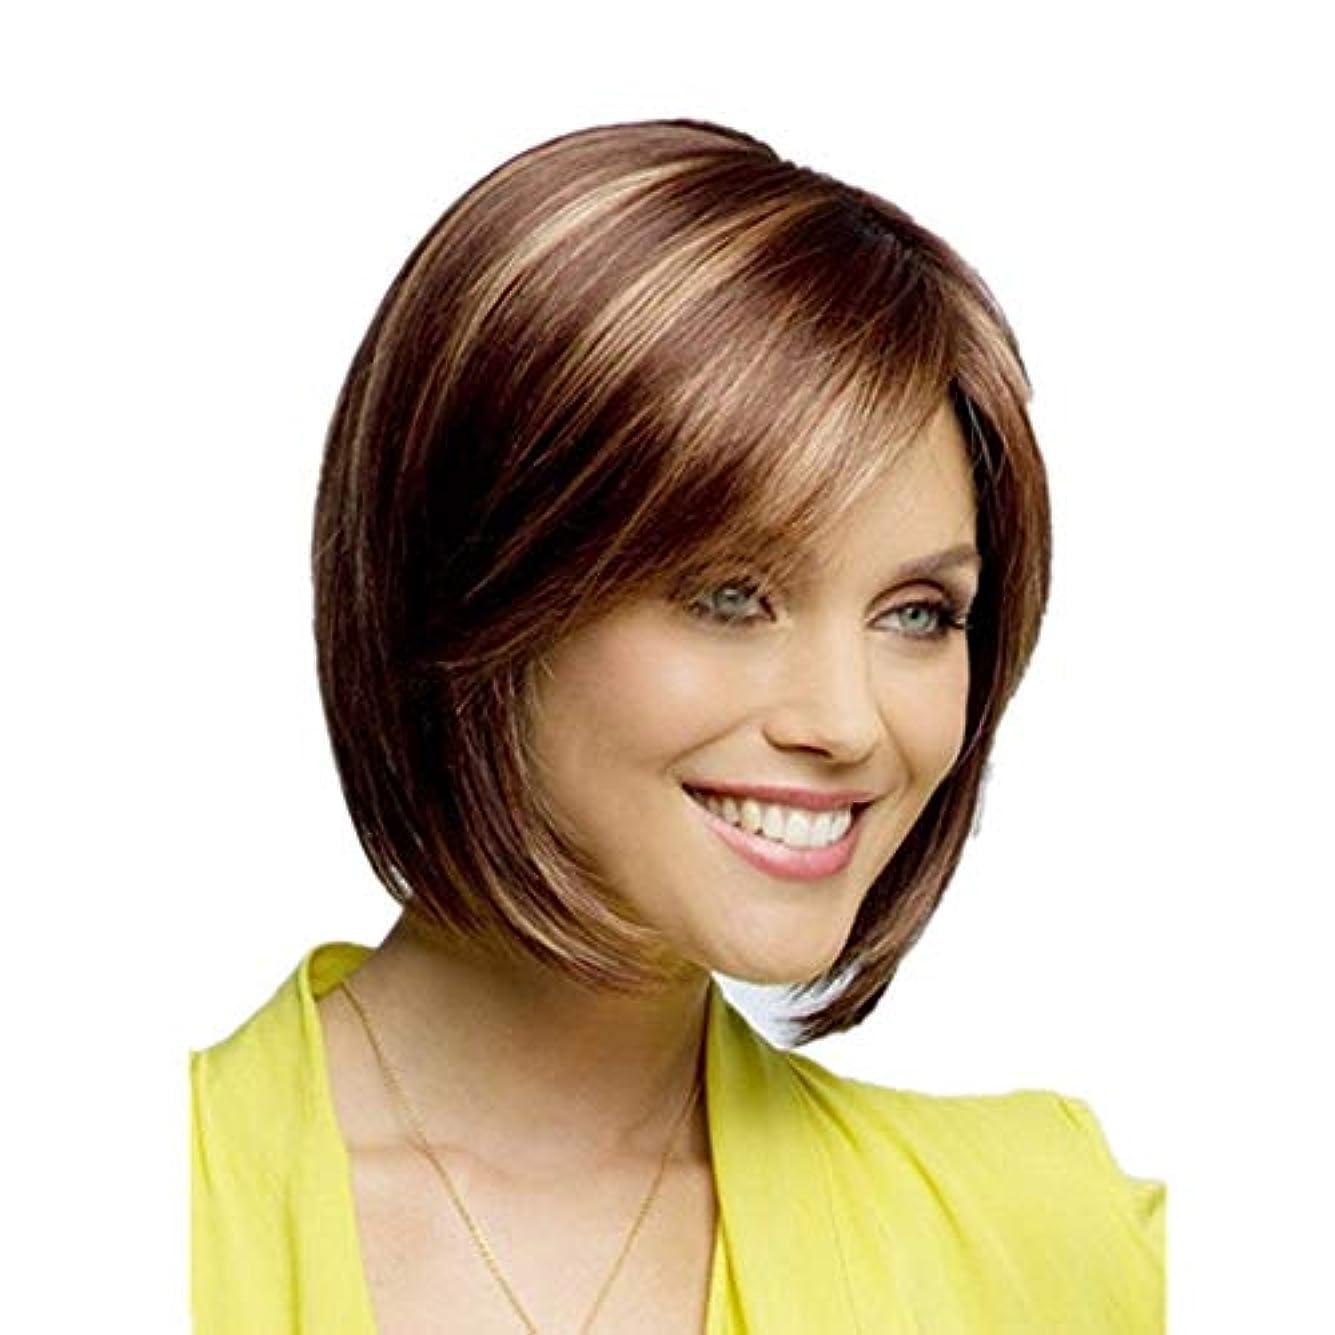 WASAIO 女性の短い巻き毛のかつら茶色の短い髪混合色ストレート人工毛ウィッグ (色 : Photo color)